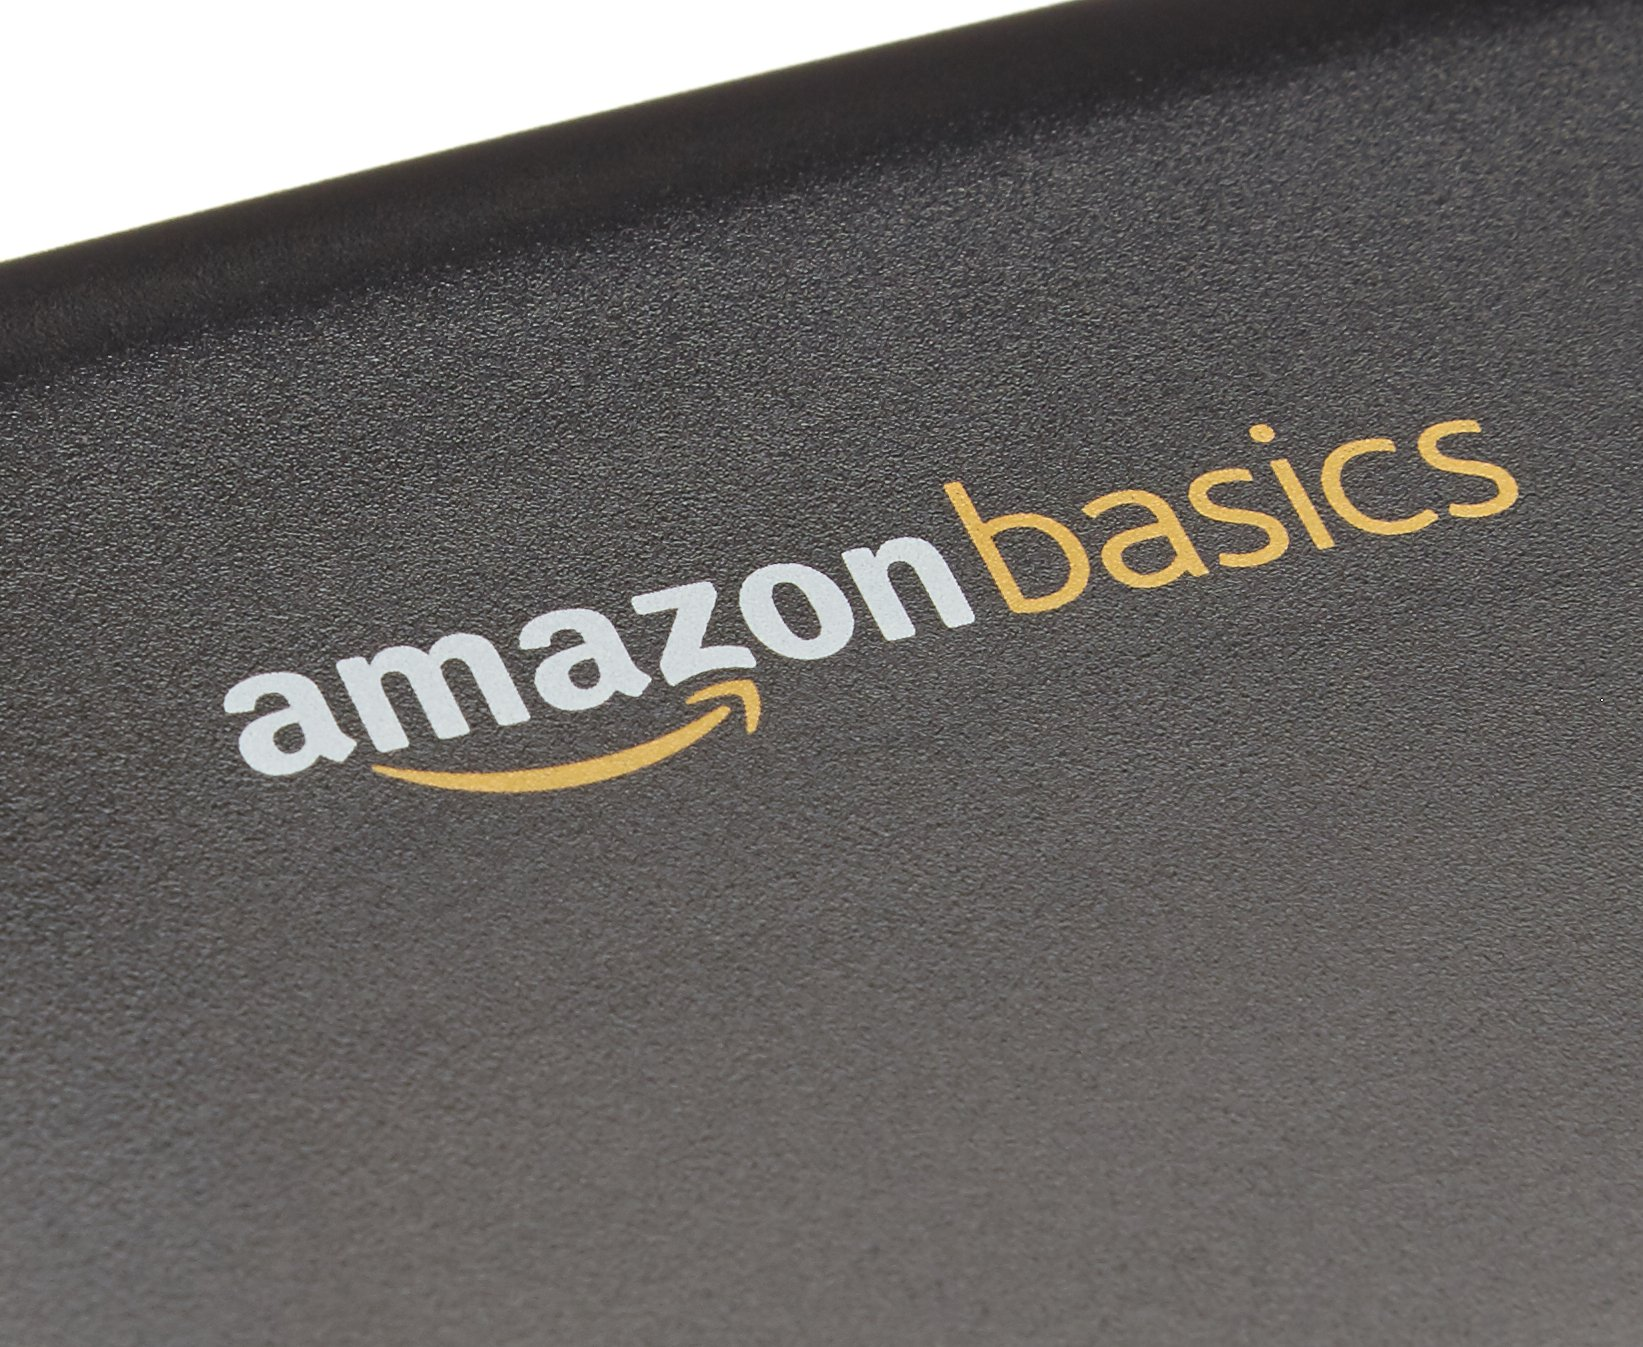 AmazonBasics 6-Sheet Cross-Cut Paper and Credit Card Shredder